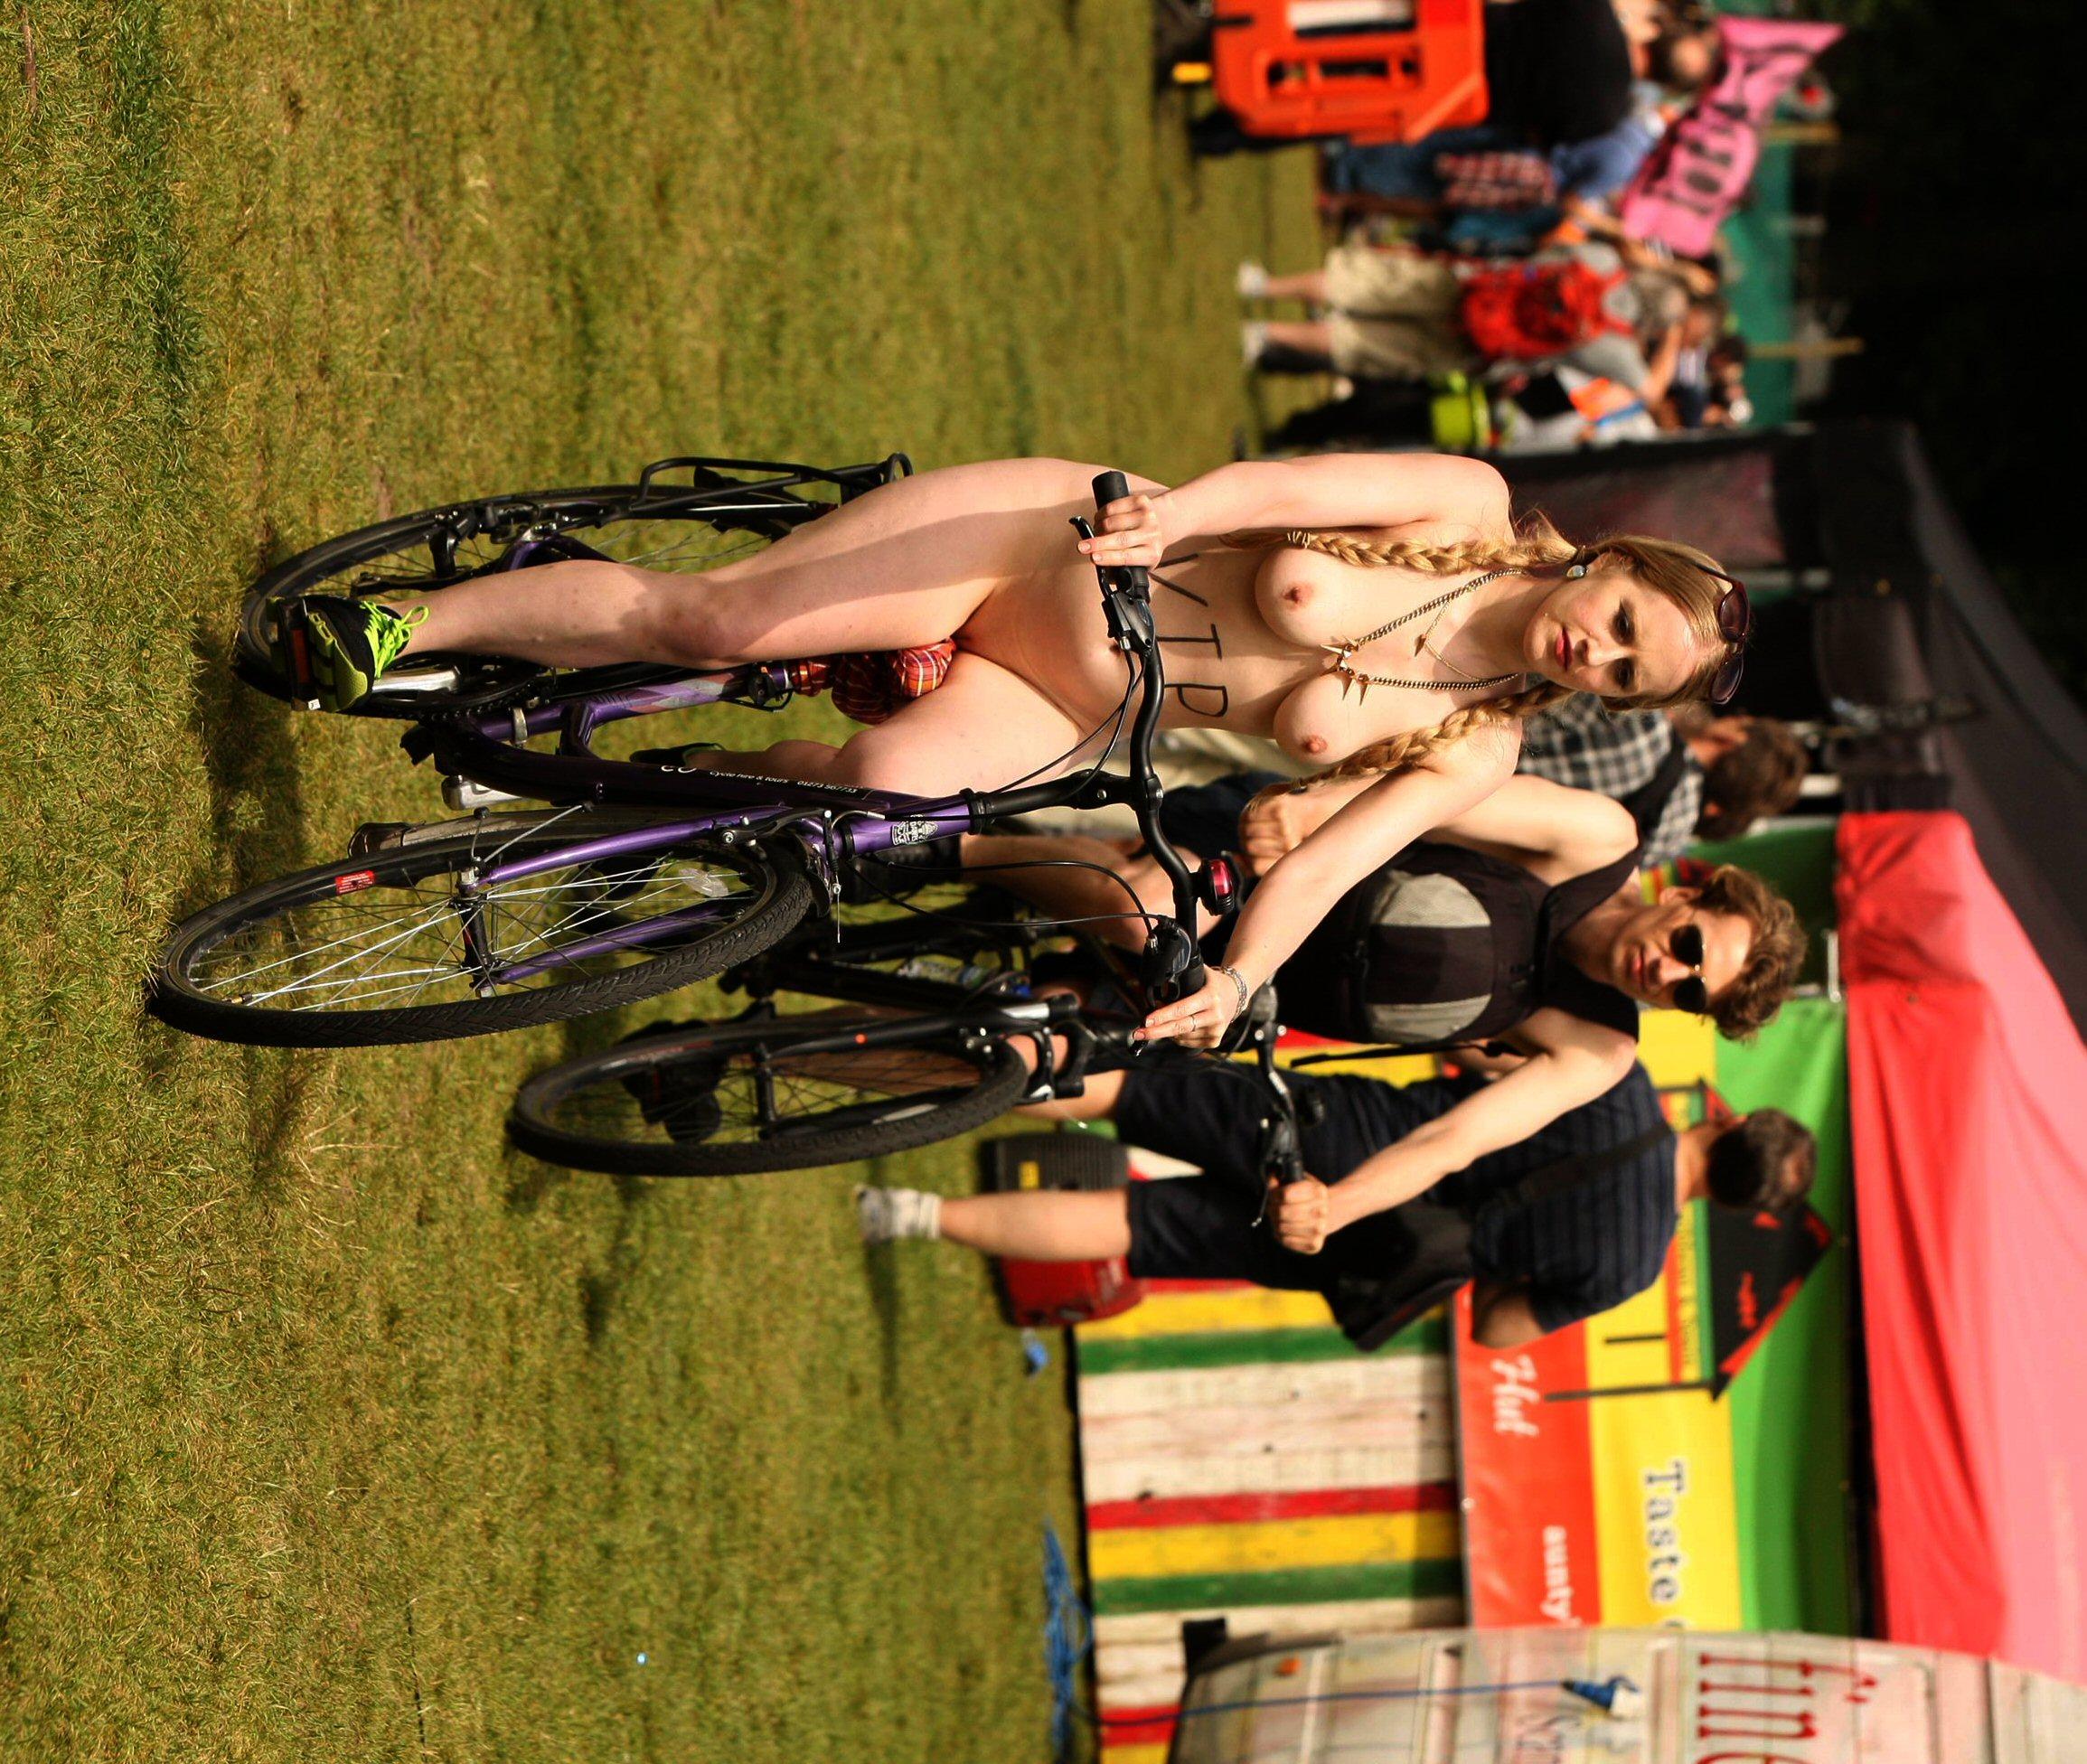 Naked bike ride new orleans